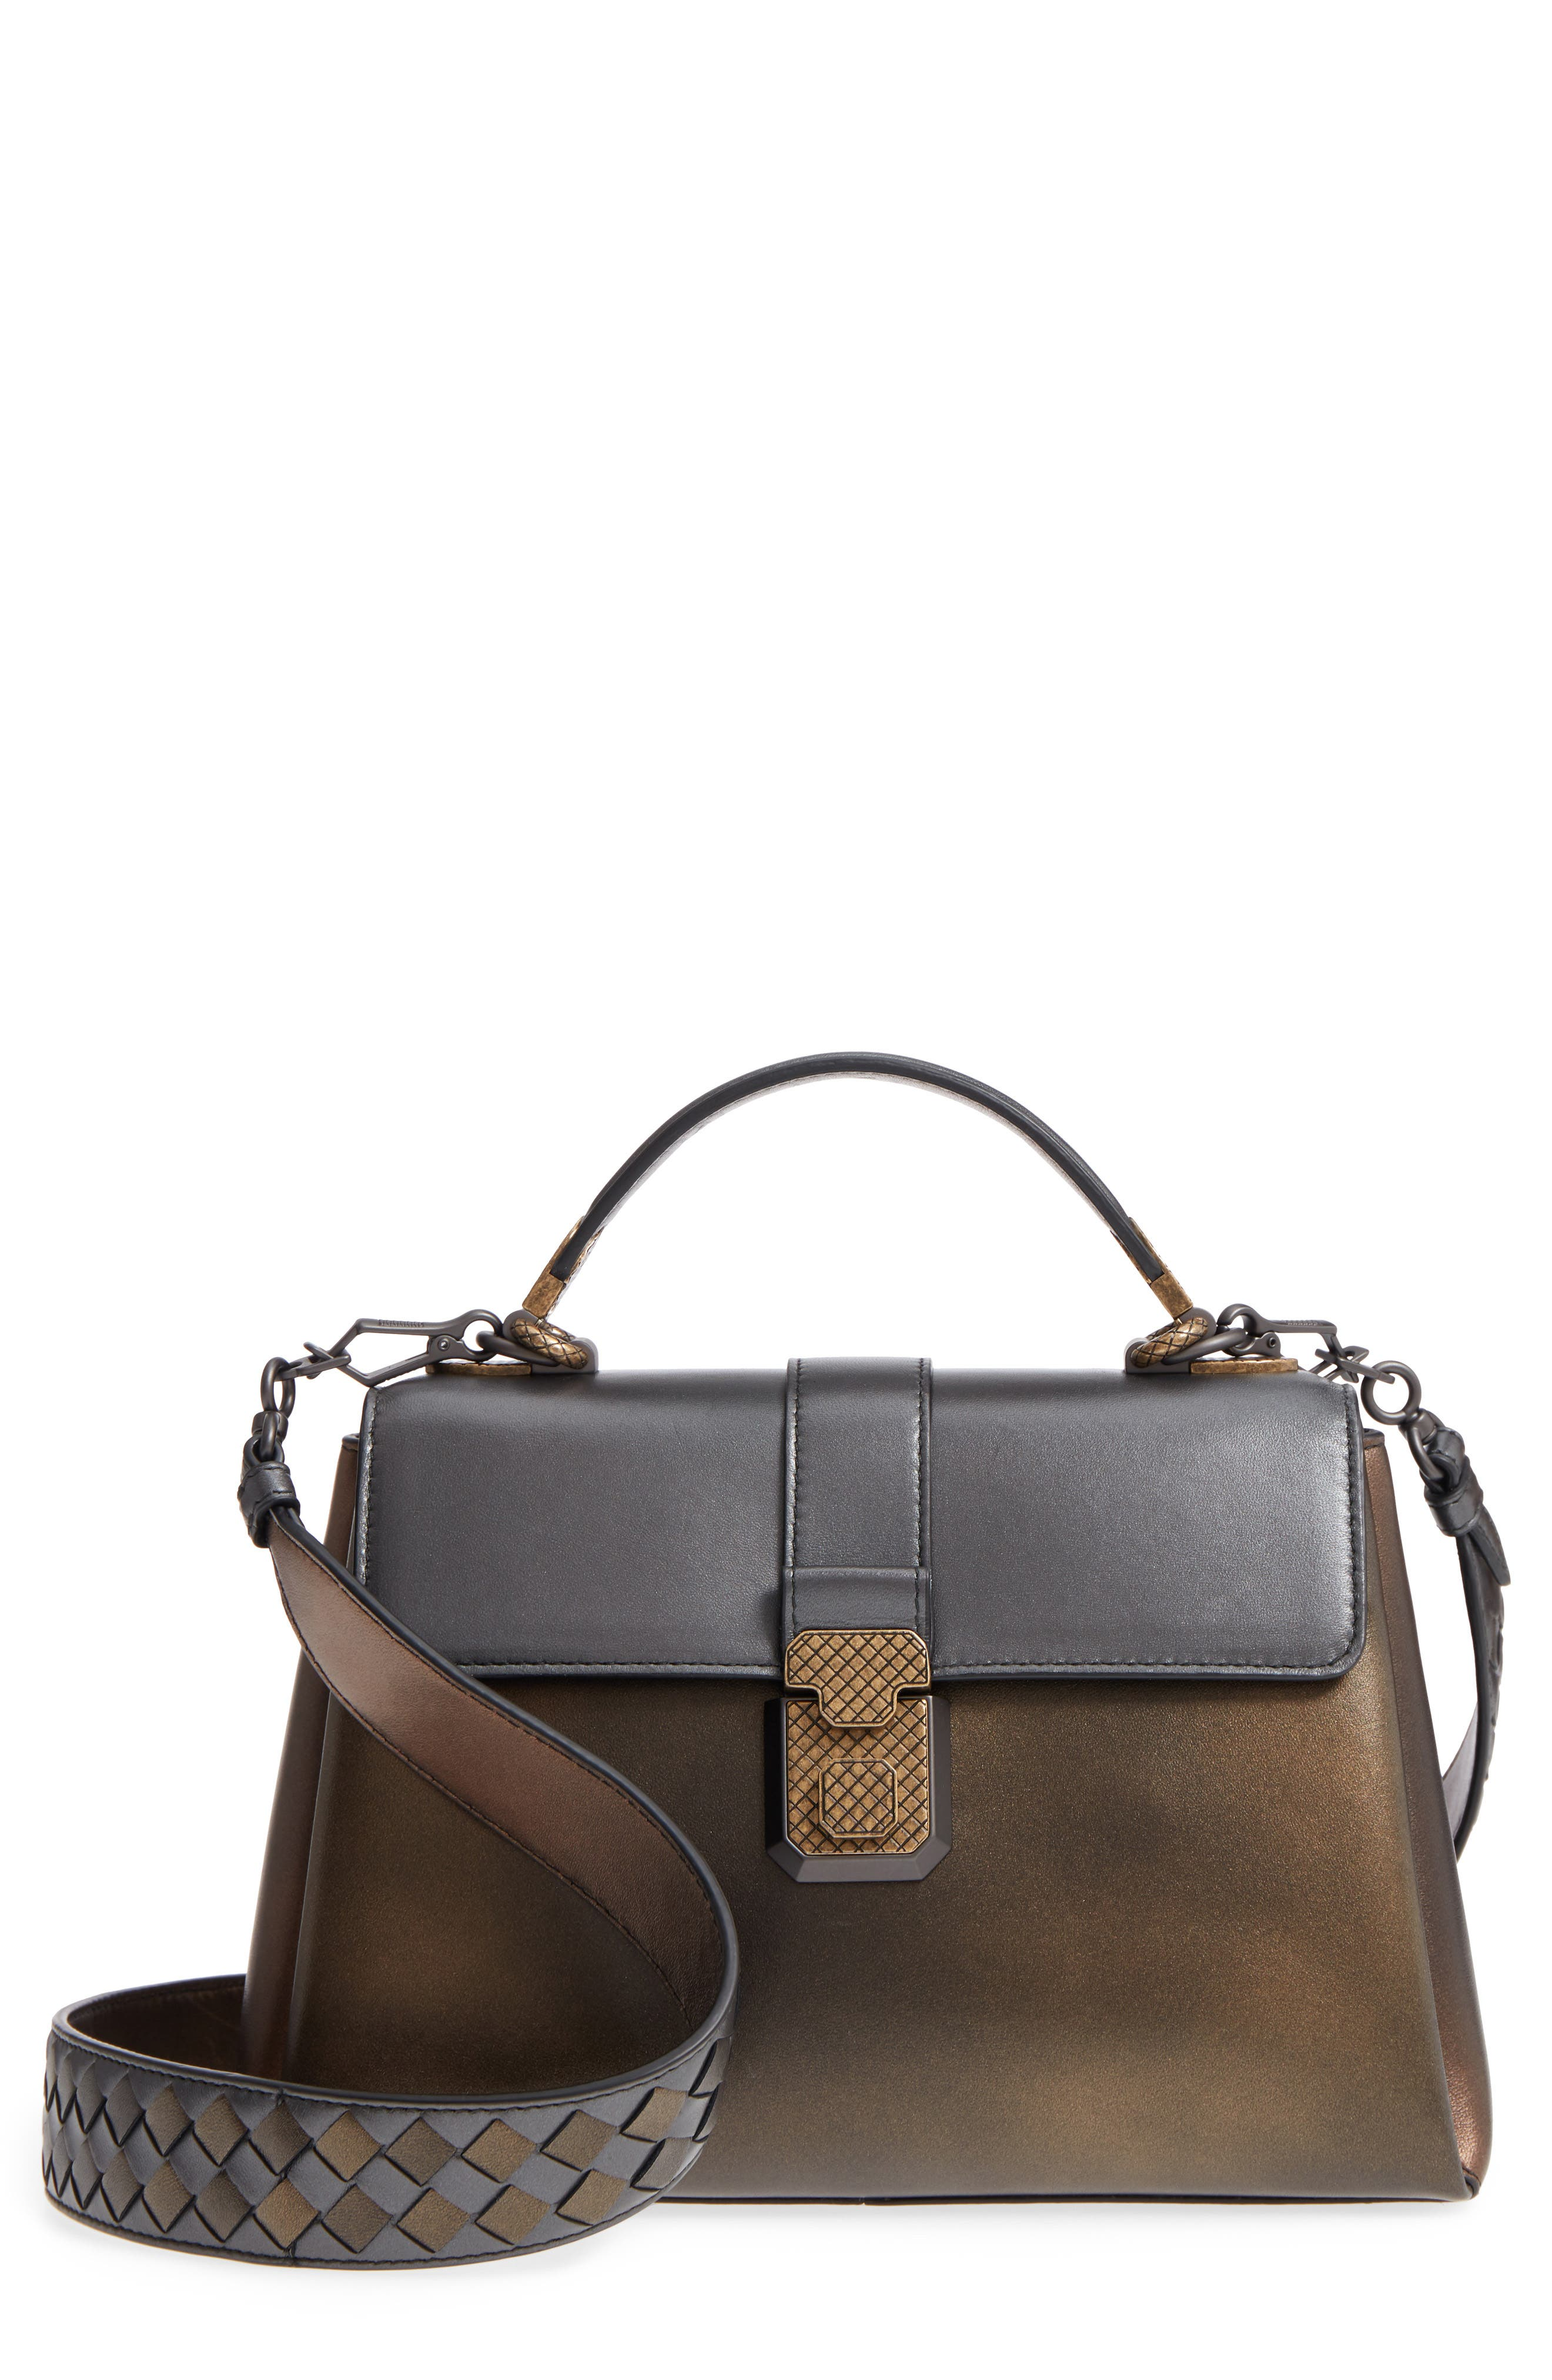 Small Piazza Tricolor Metallic Leather Handbag,                             Main thumbnail 1, color,                             DARK GOLD MULTI